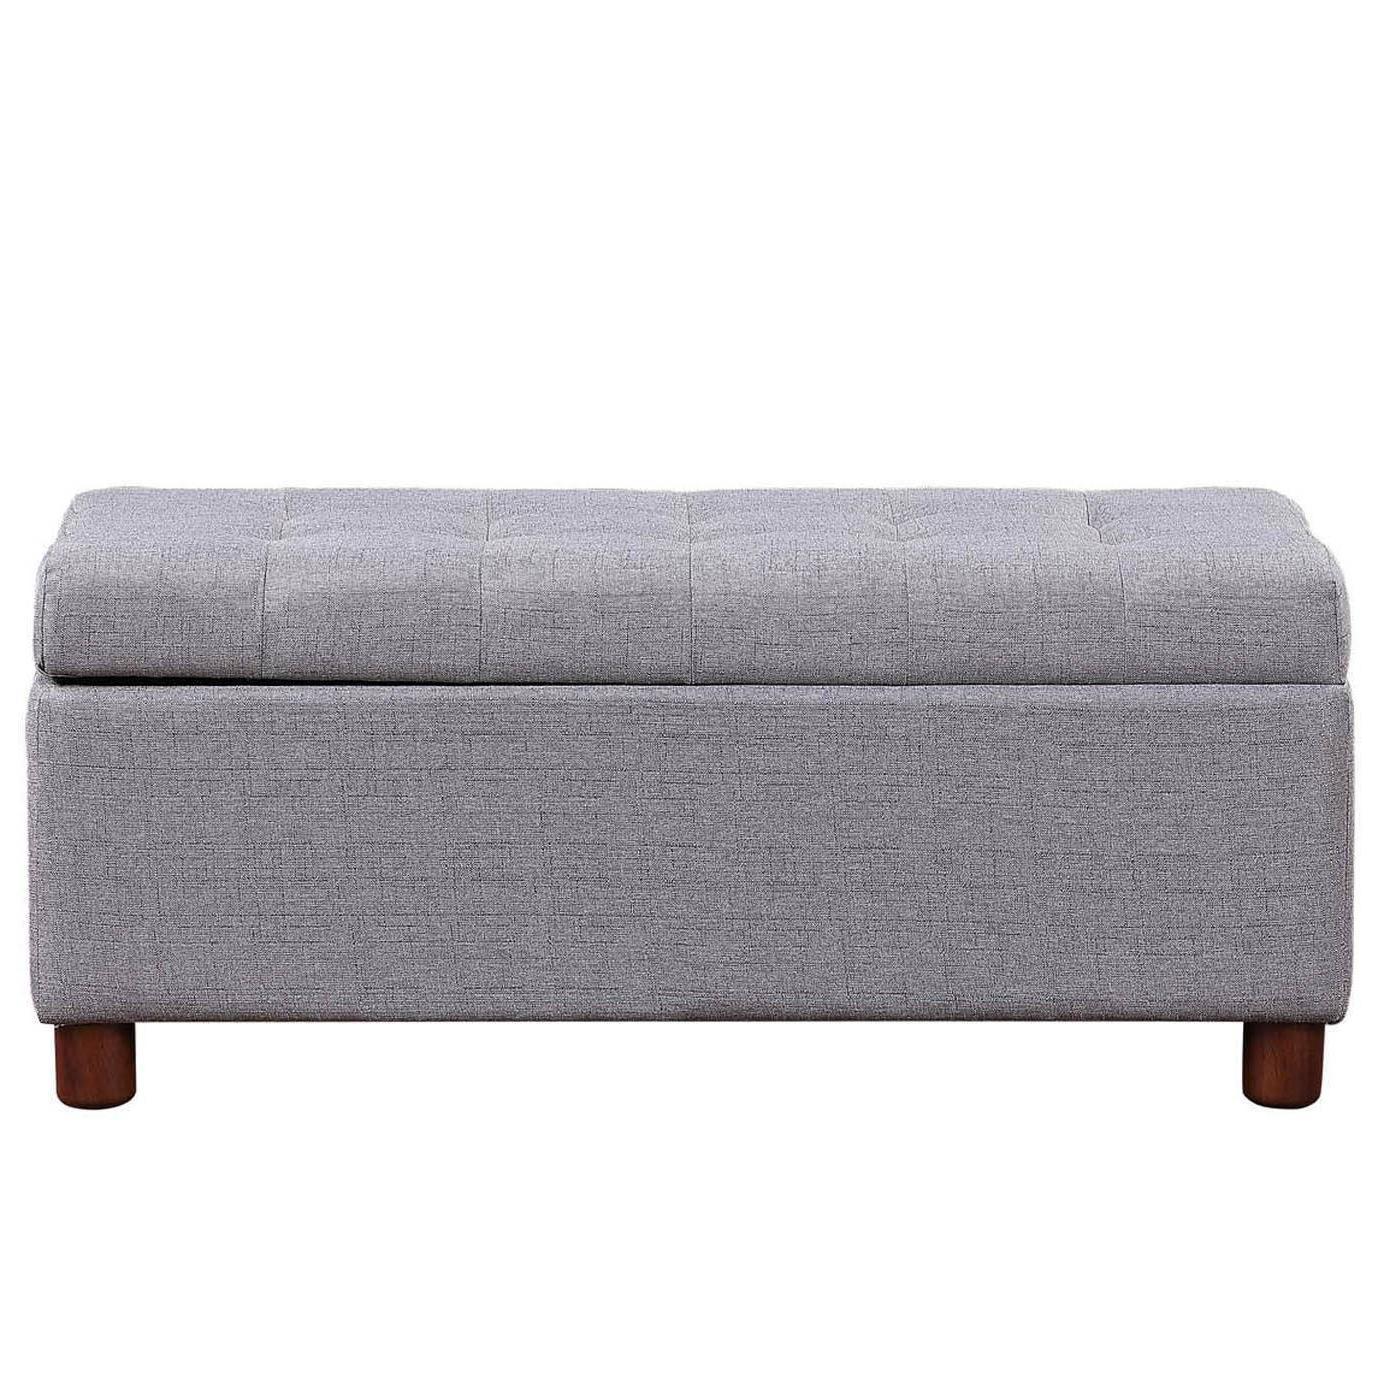 39 rectangular storage bench tufted linen fabric